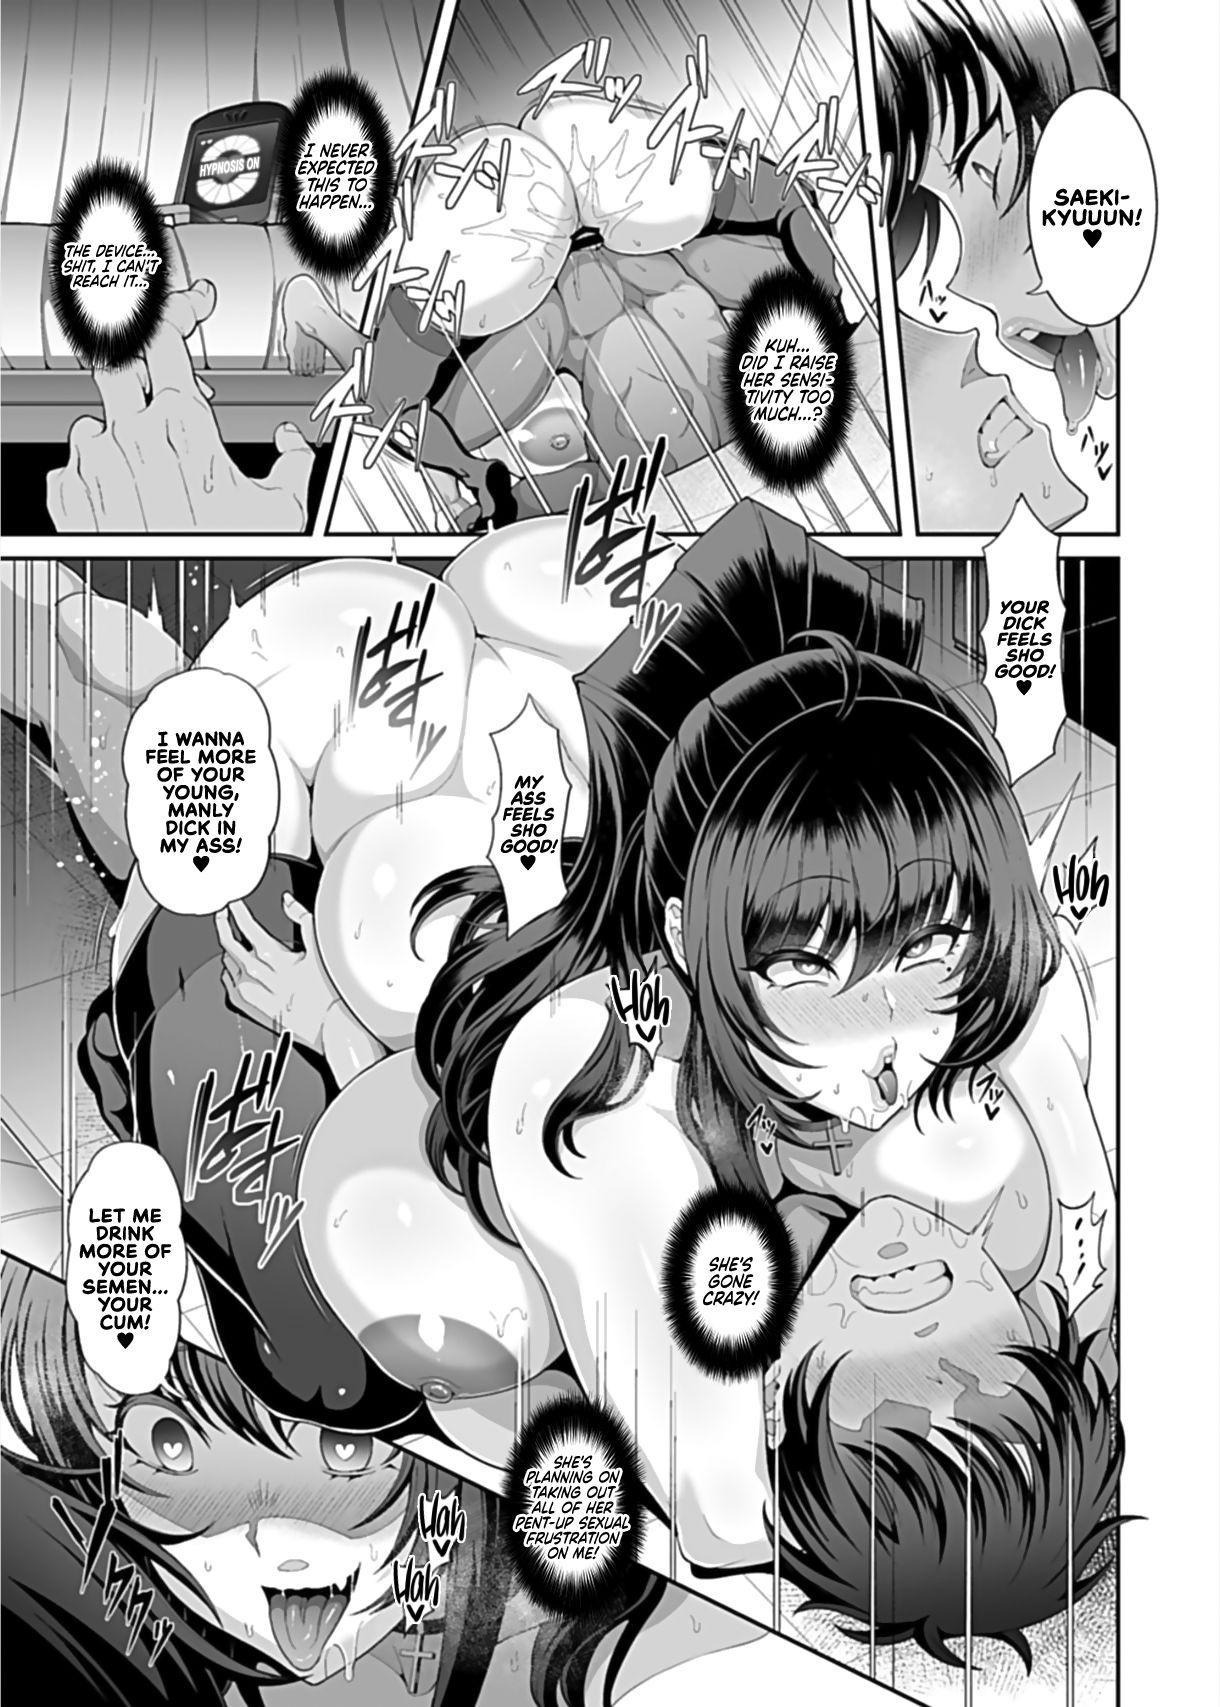 [Tawara Hiryuu] Saimin Seikatsu [Sonobe Ayako Hen] | Hypnotic Sexual Life [Sonobe Ayako In Heat Chapter] (COMIC GEE Vol. 7) [English] [RedLantern] 13